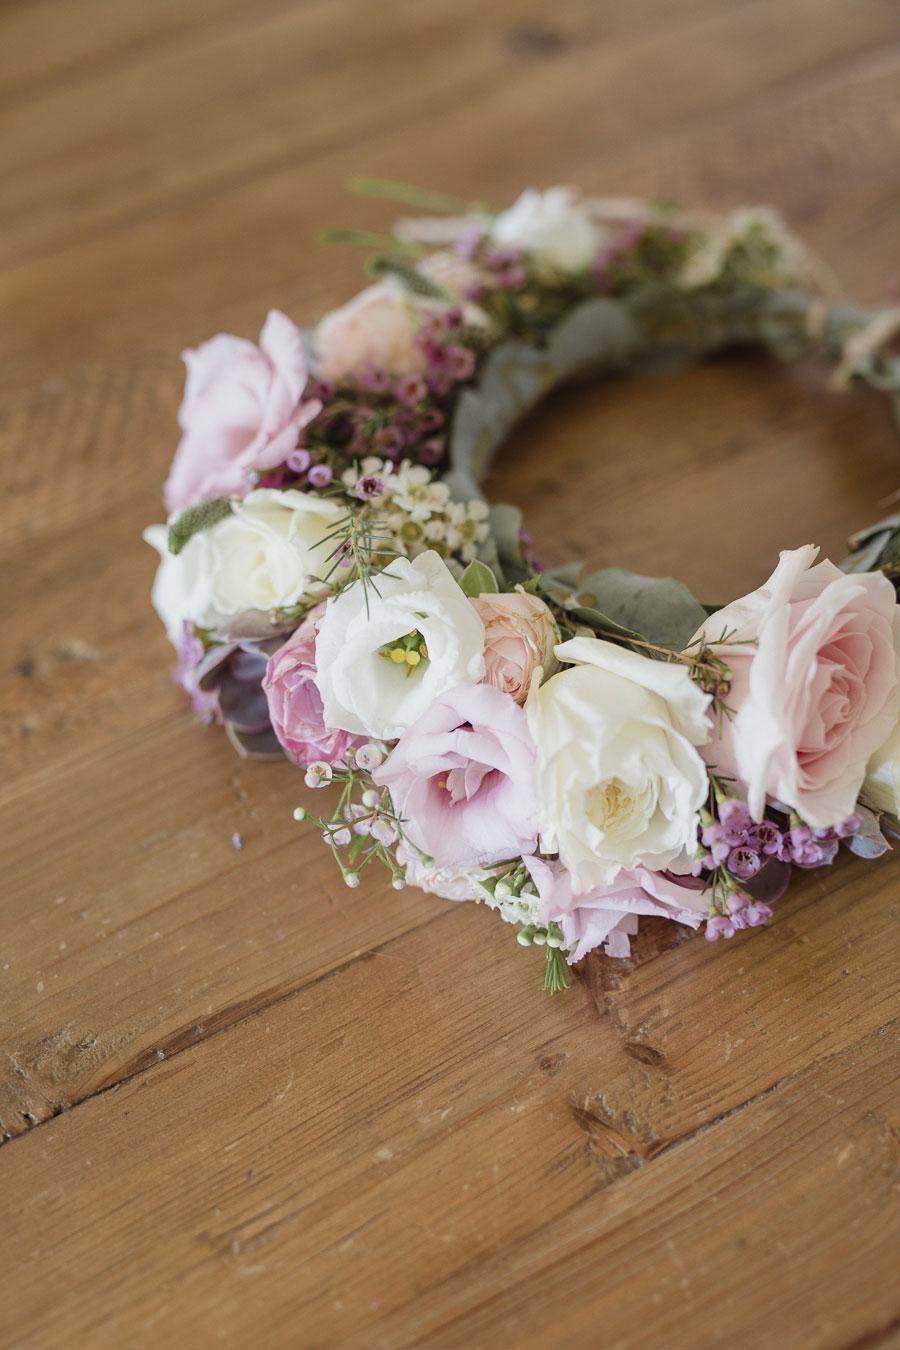 Wedding-Nicholad-and-Federica-Giuseppe-Giovannelli-310